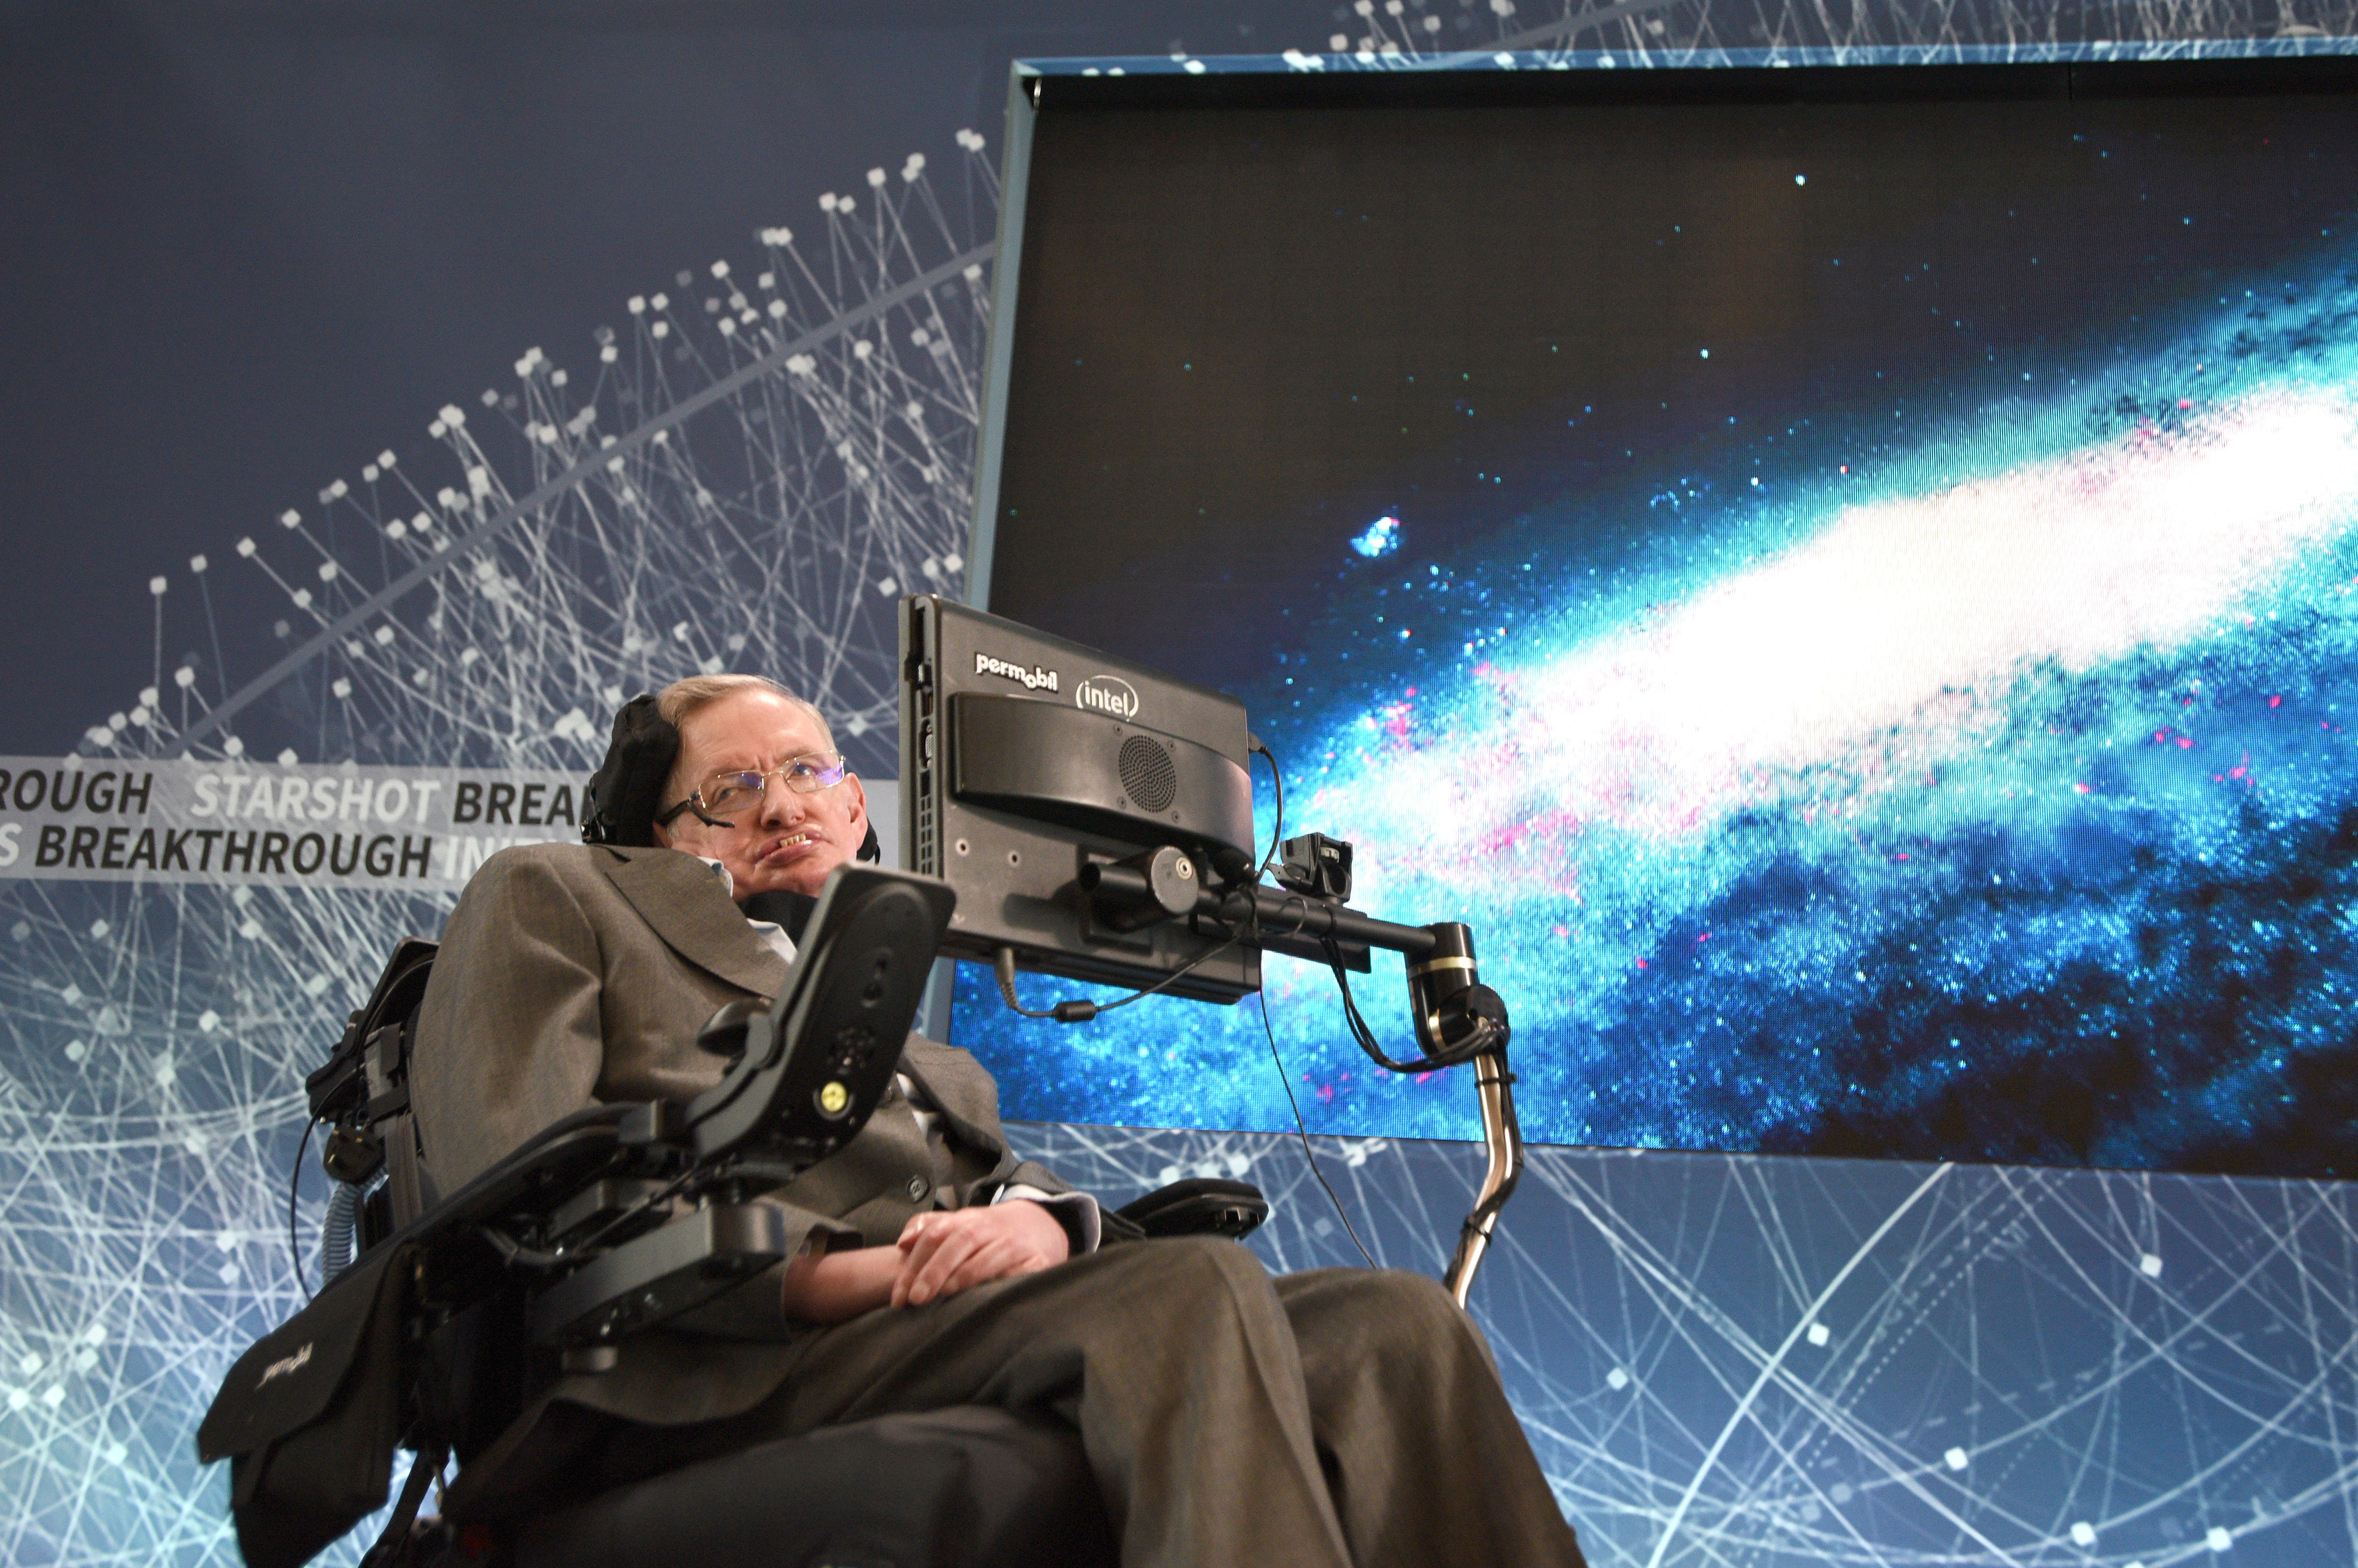 Stephen Hawking morto